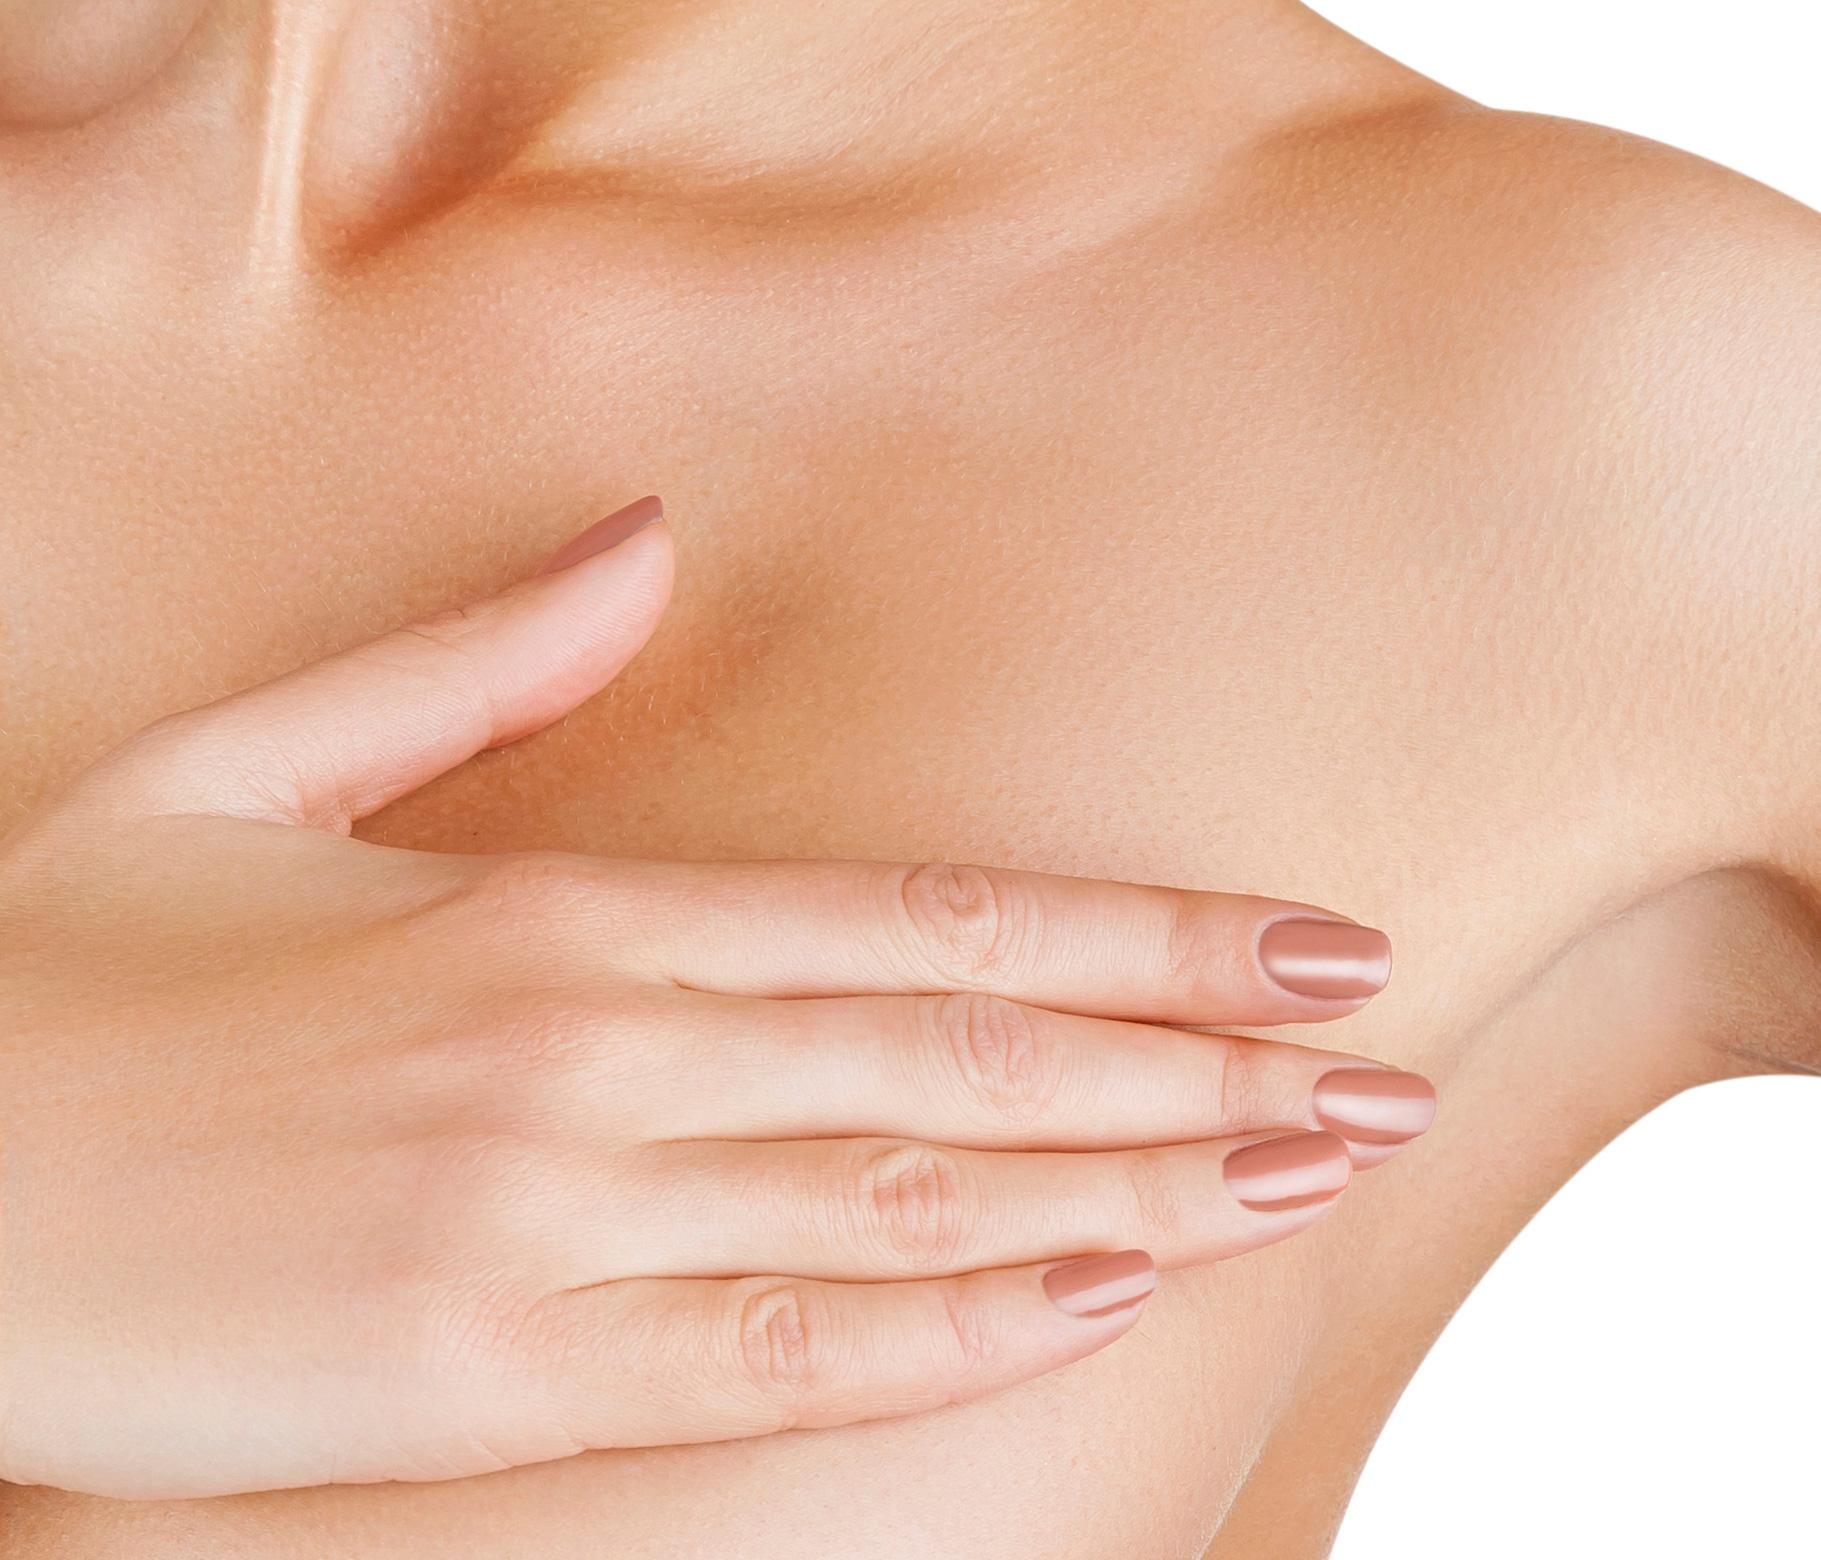 breast-examination_w.jpg